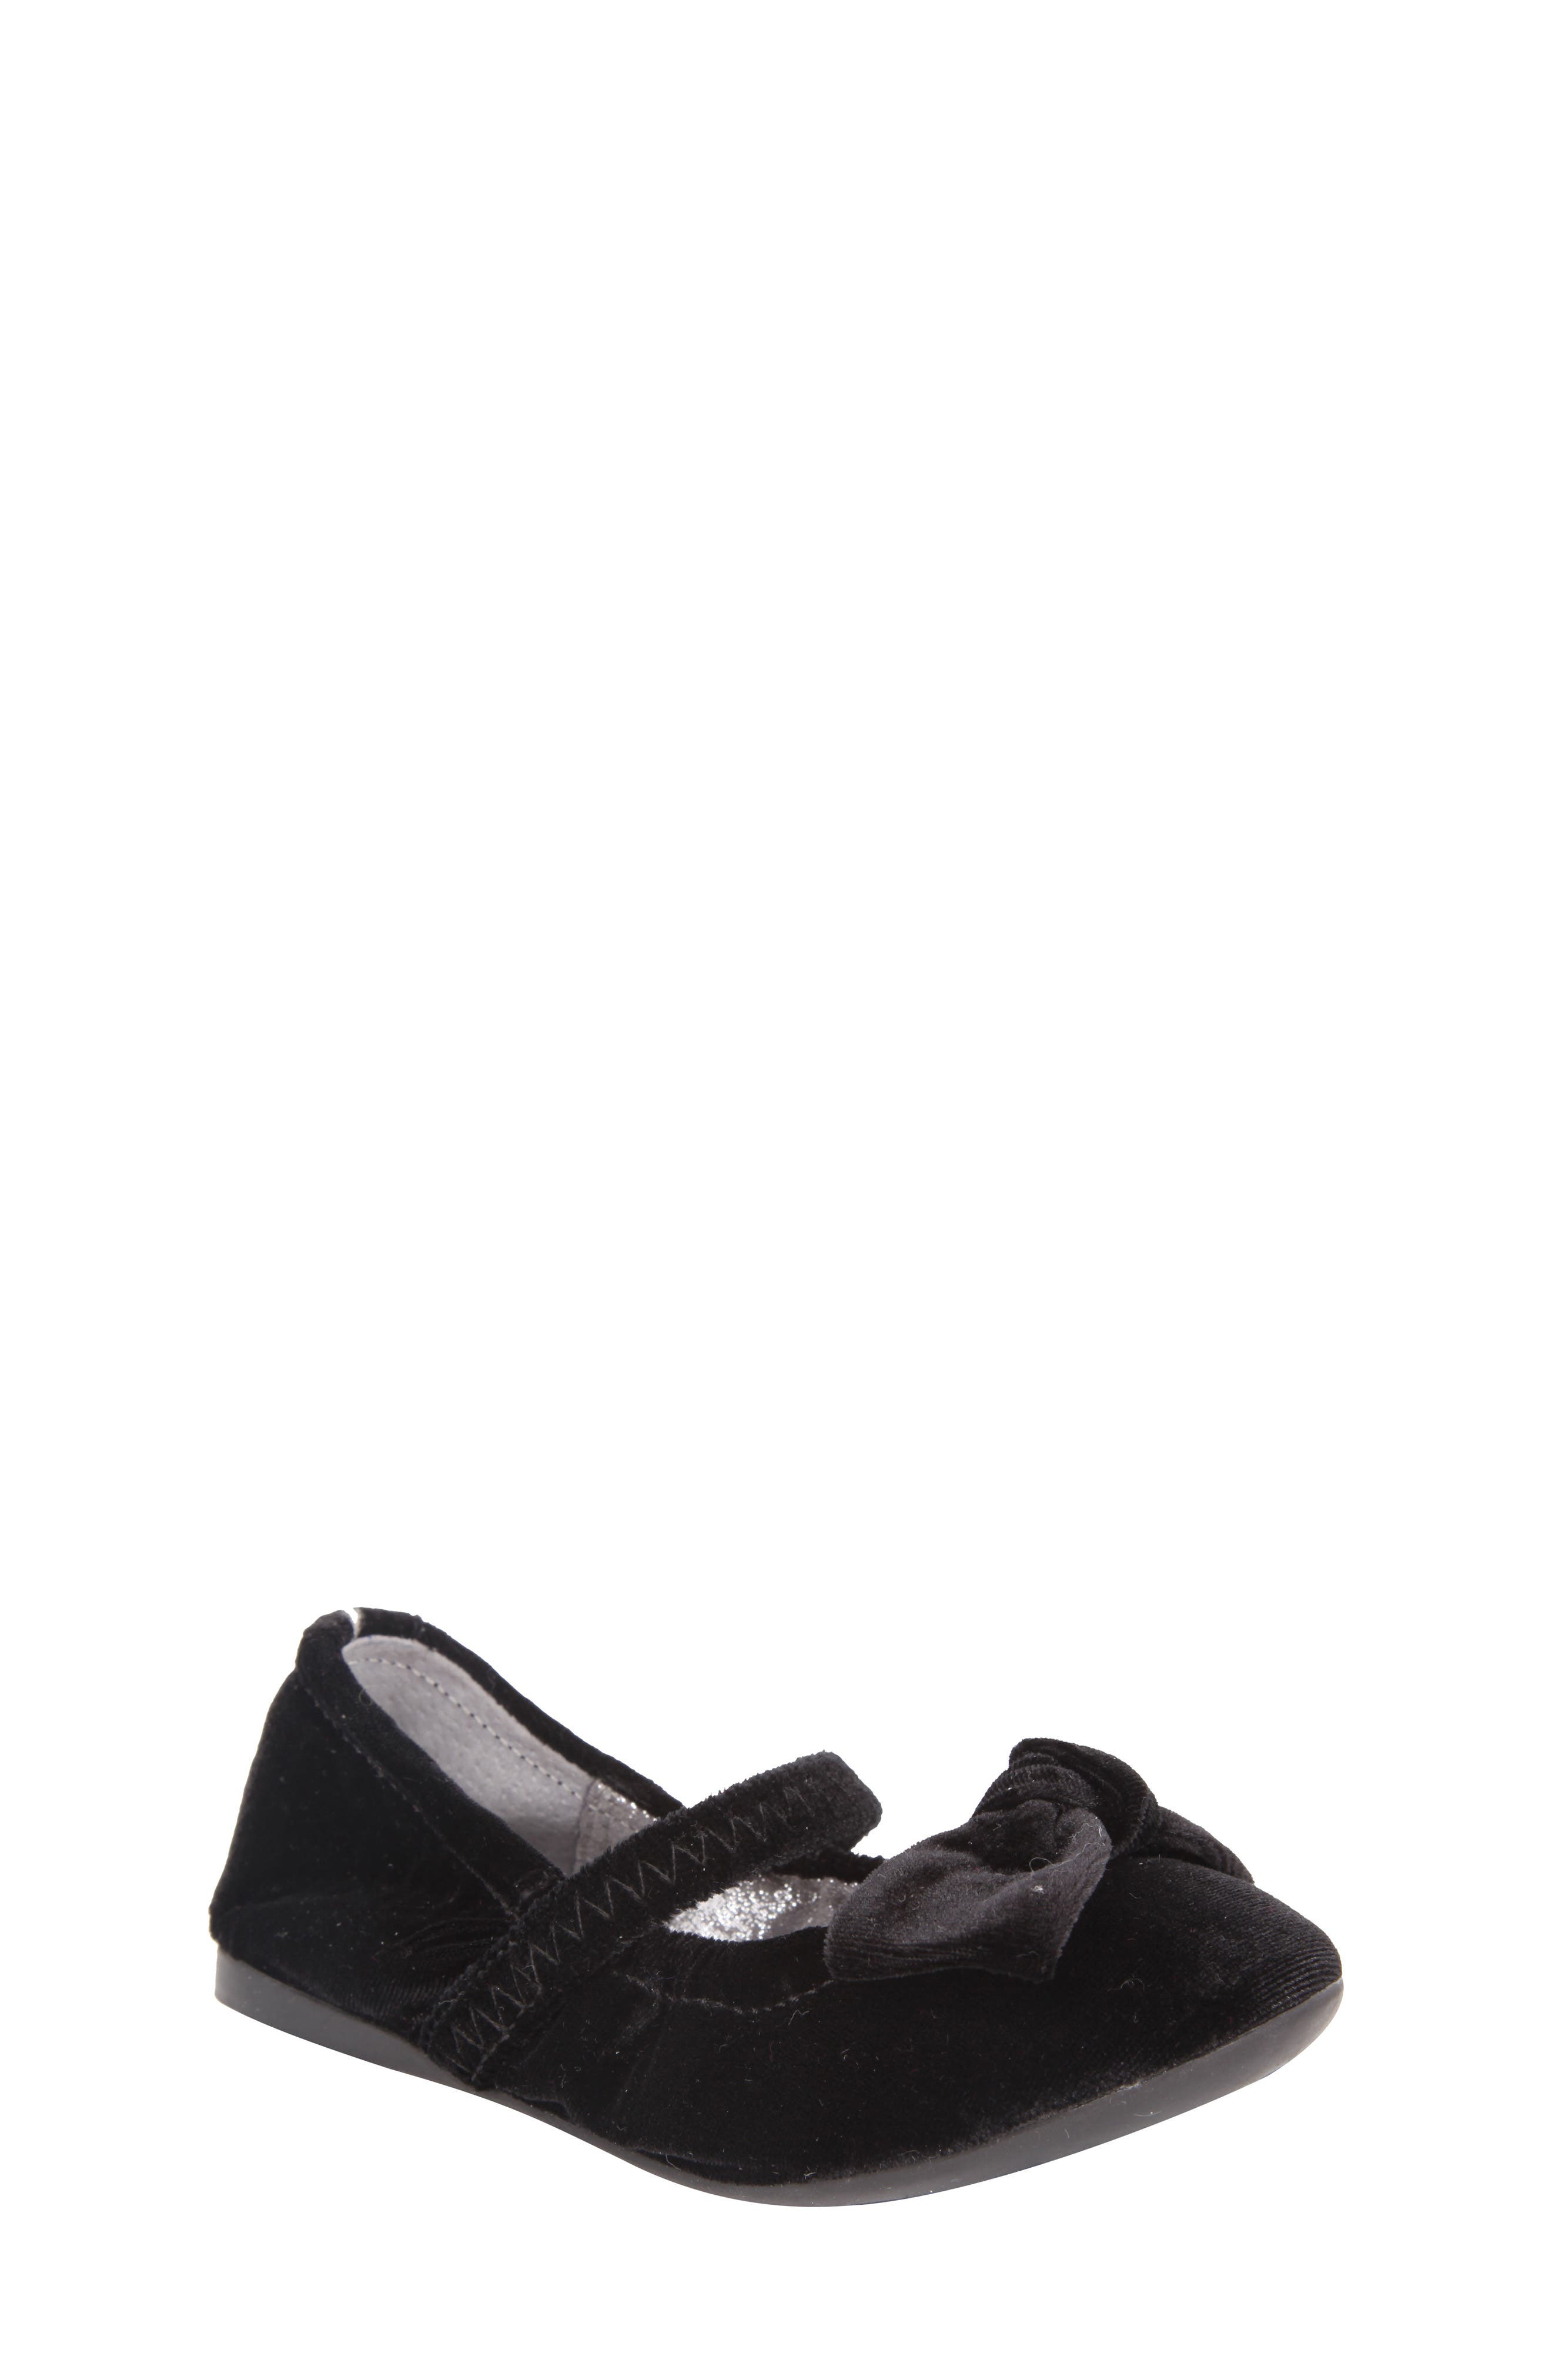 Karla Mary Jane Ballet Flat, Main, color, 005